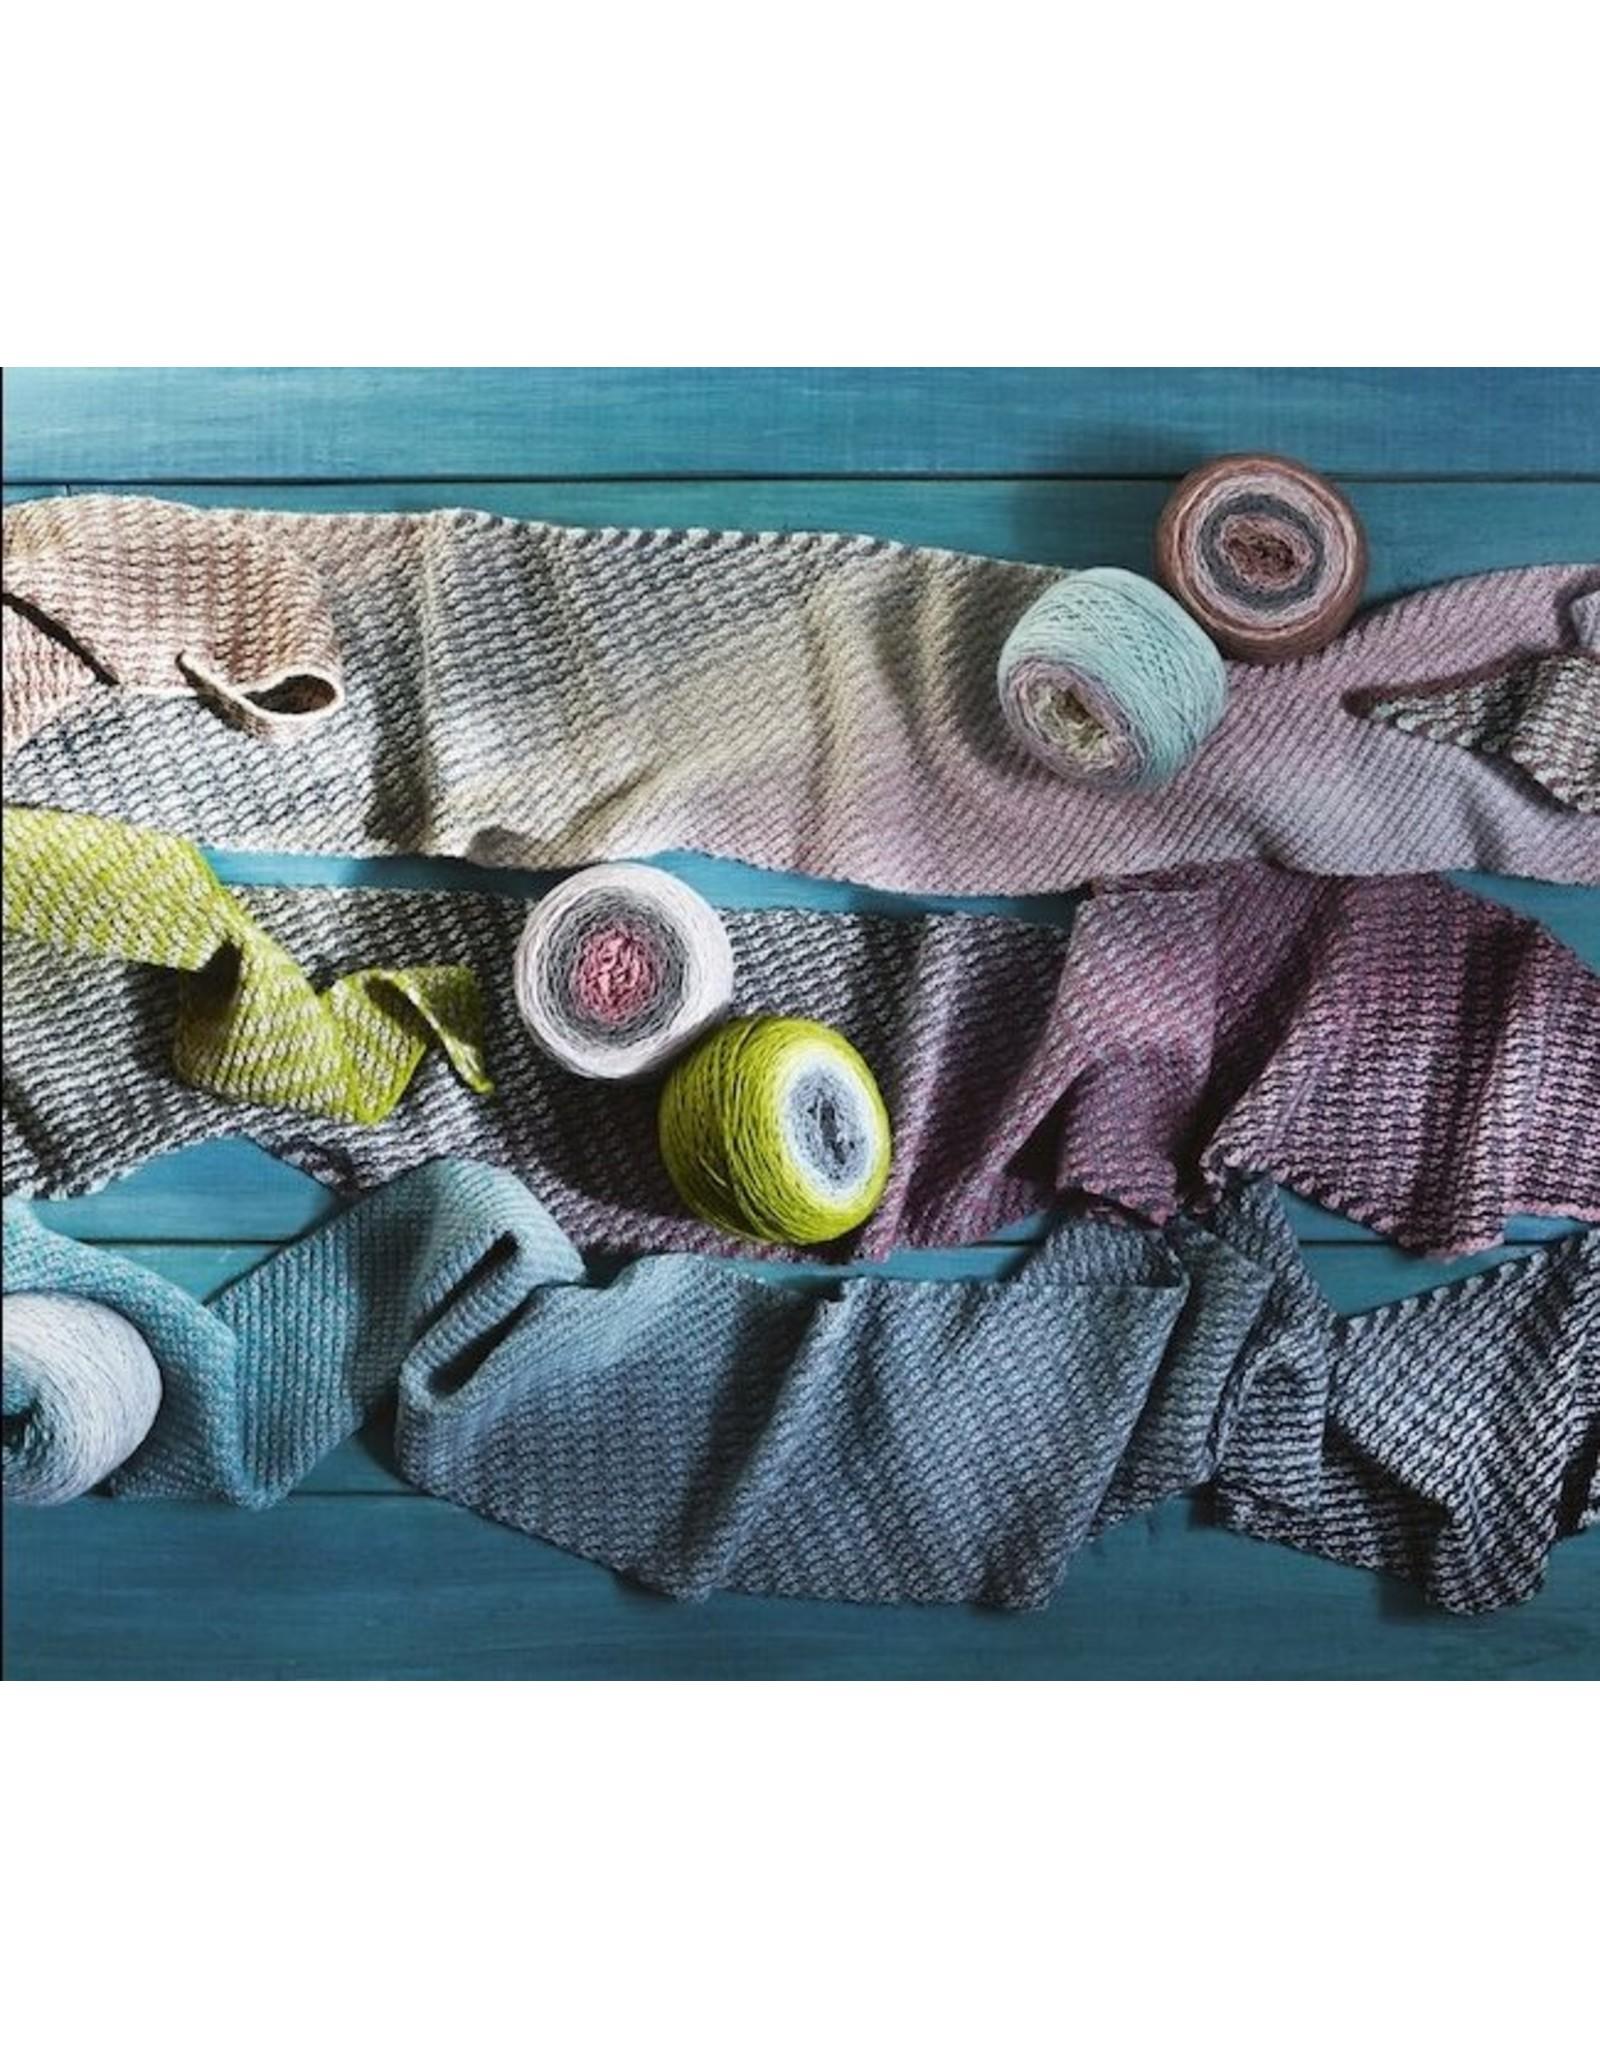 Modern Daily Knitting (MDK) MDK Field Guide No. 5 Sequences Paperback